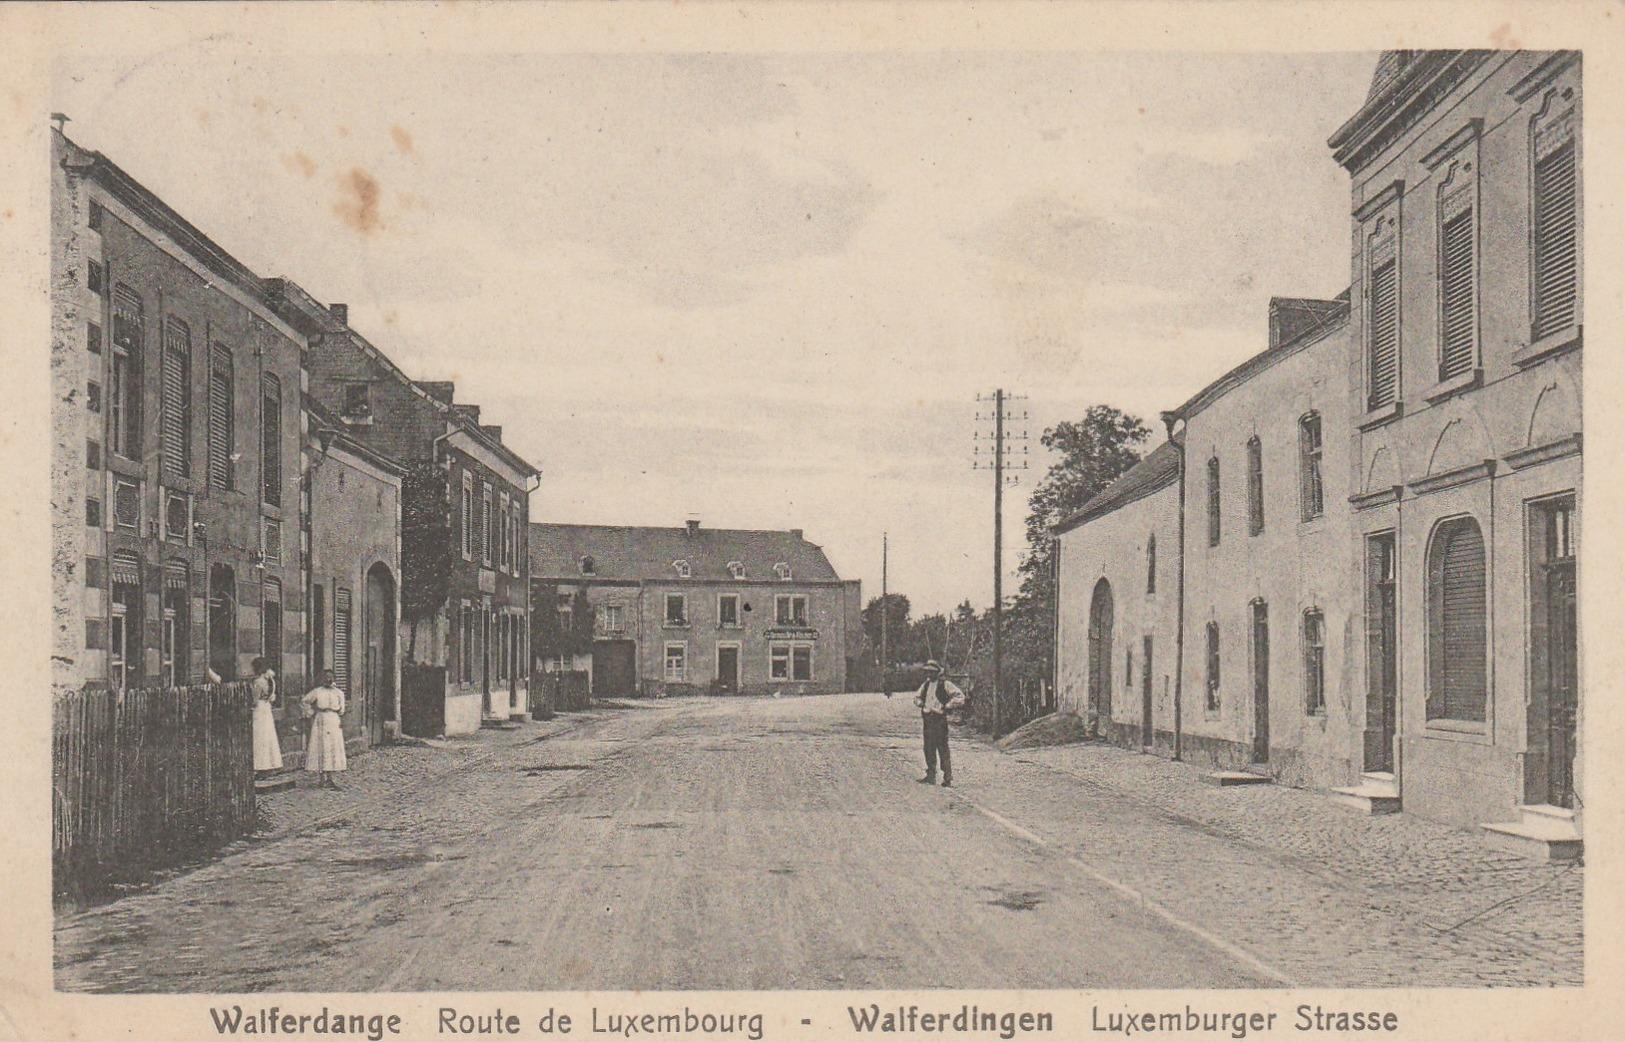 Walferdange , Route De Luxembourg , Walferdingen Luxemburger Strasse - Cartes Postales